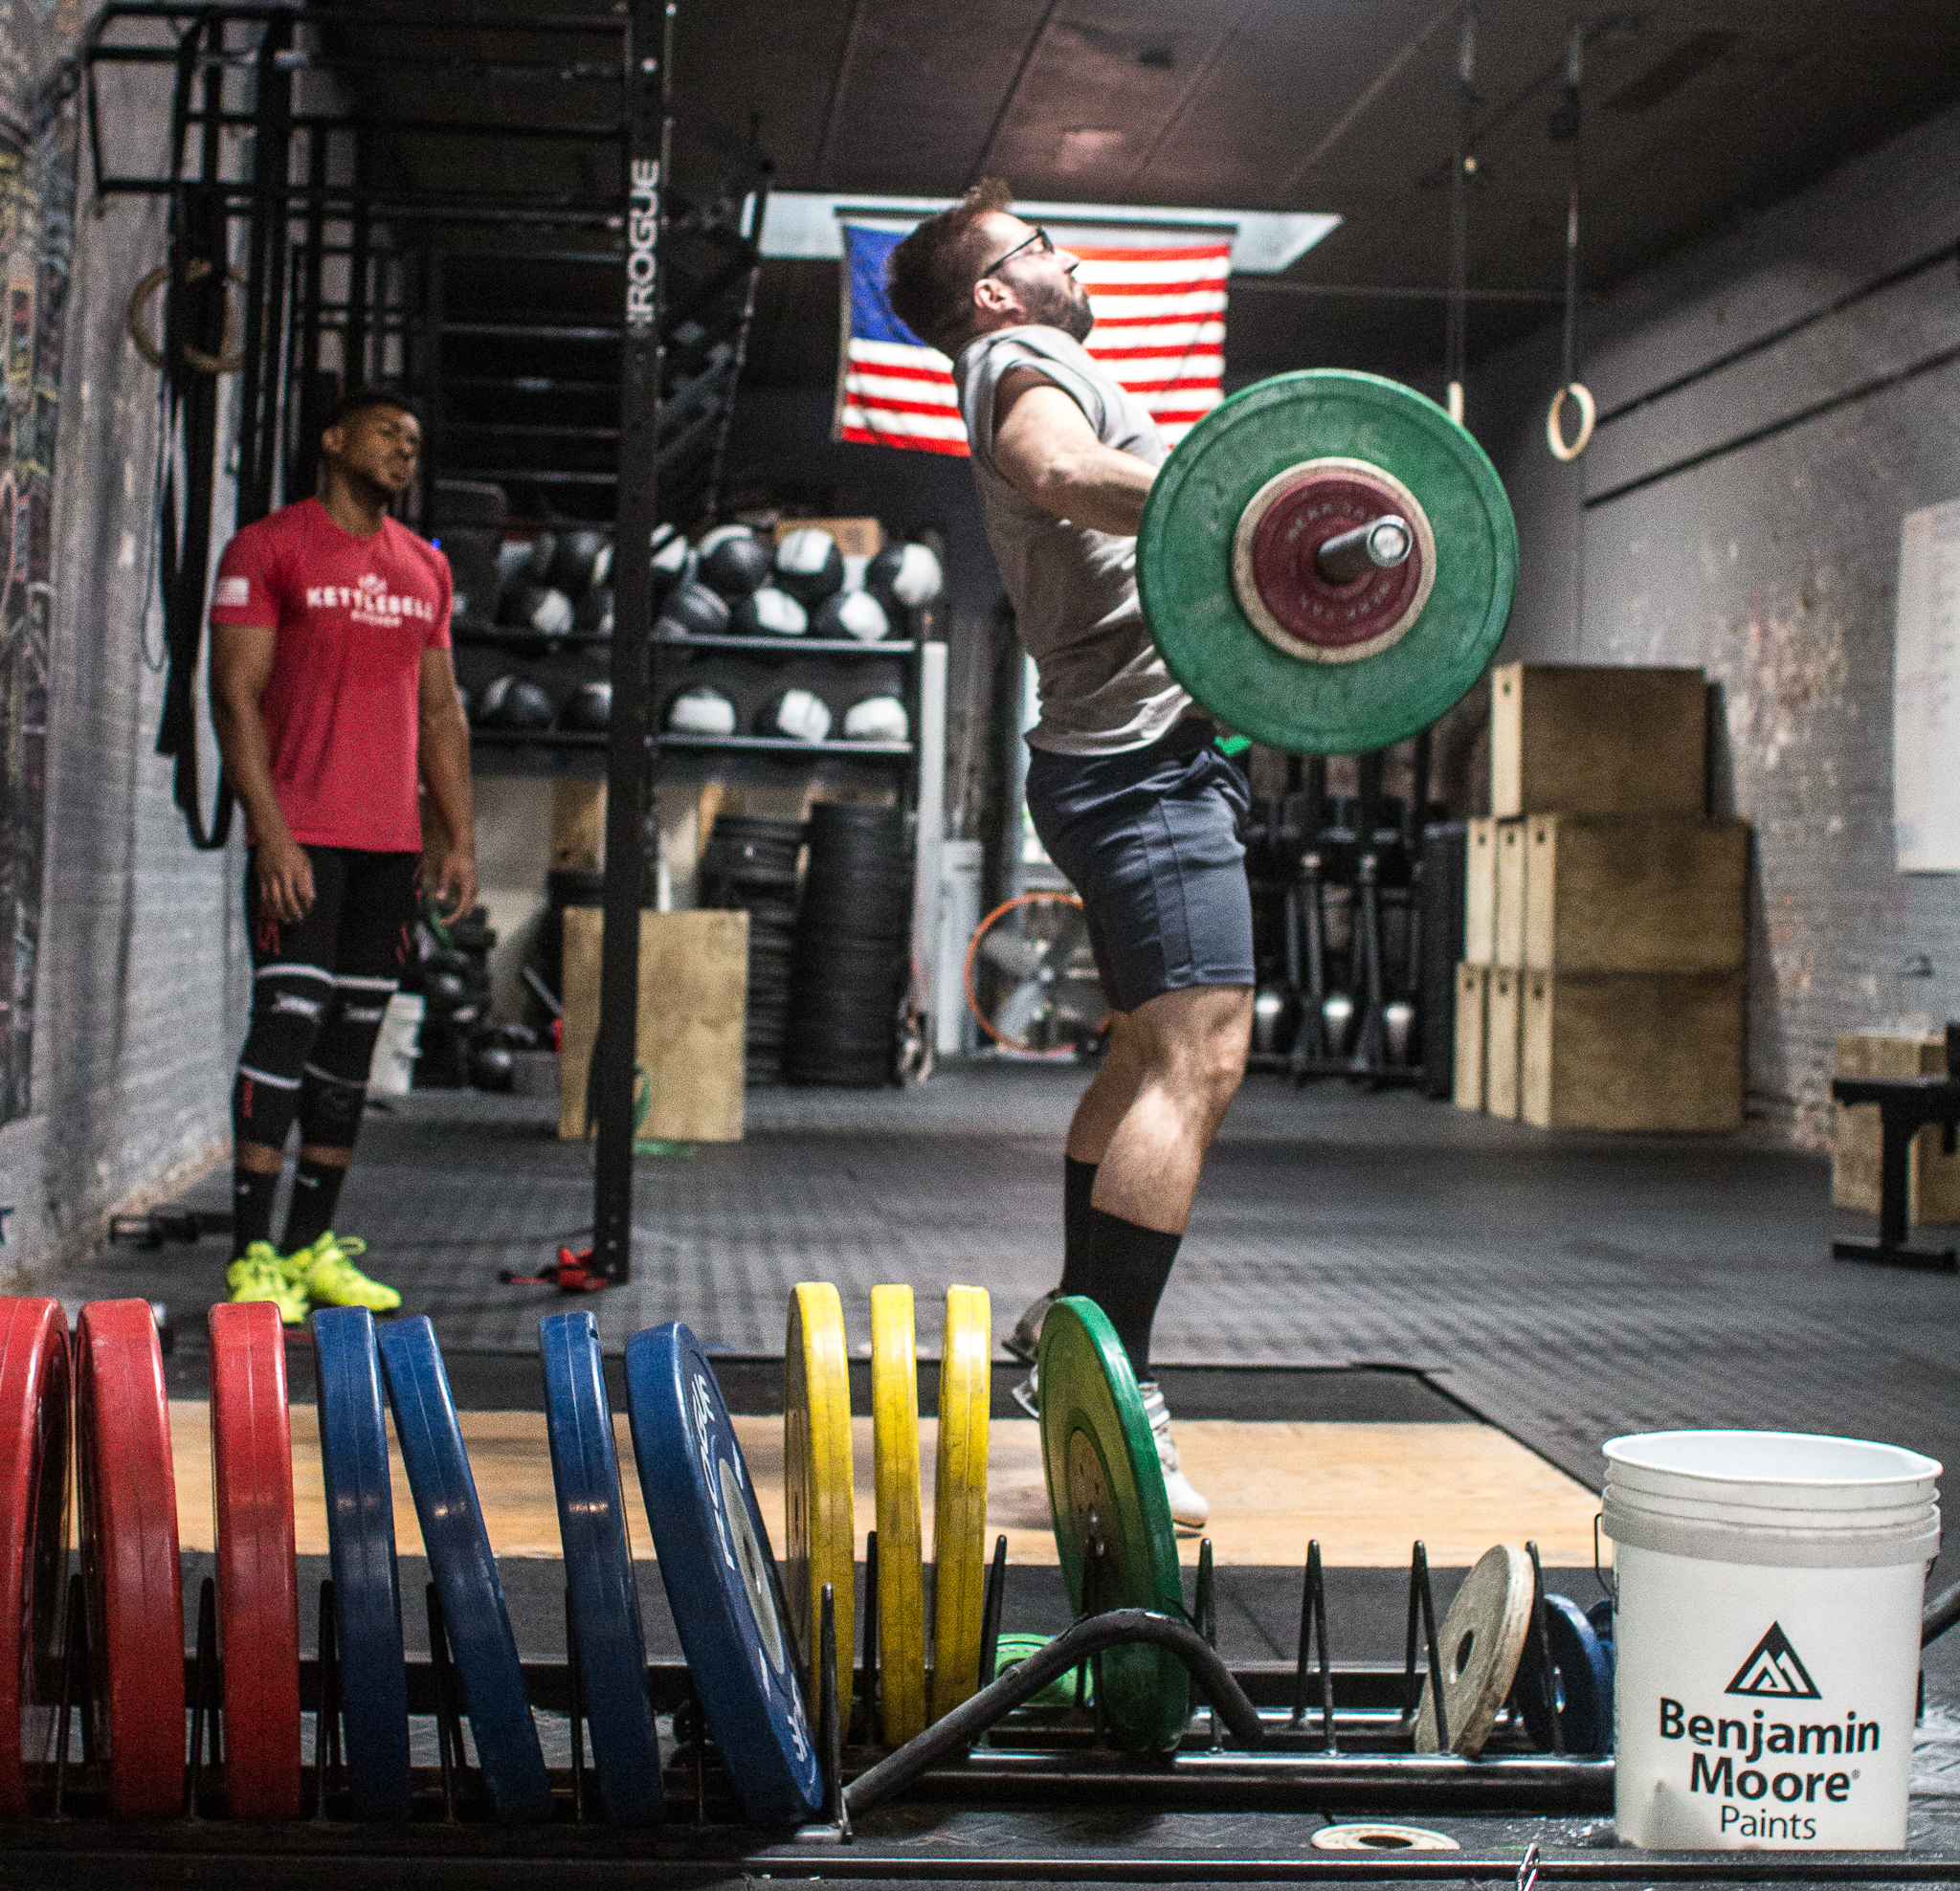 james-wright-visit-brooklyn-new-york-weightlifting-coach-teammates-october-2016 (36 of 92).jpg